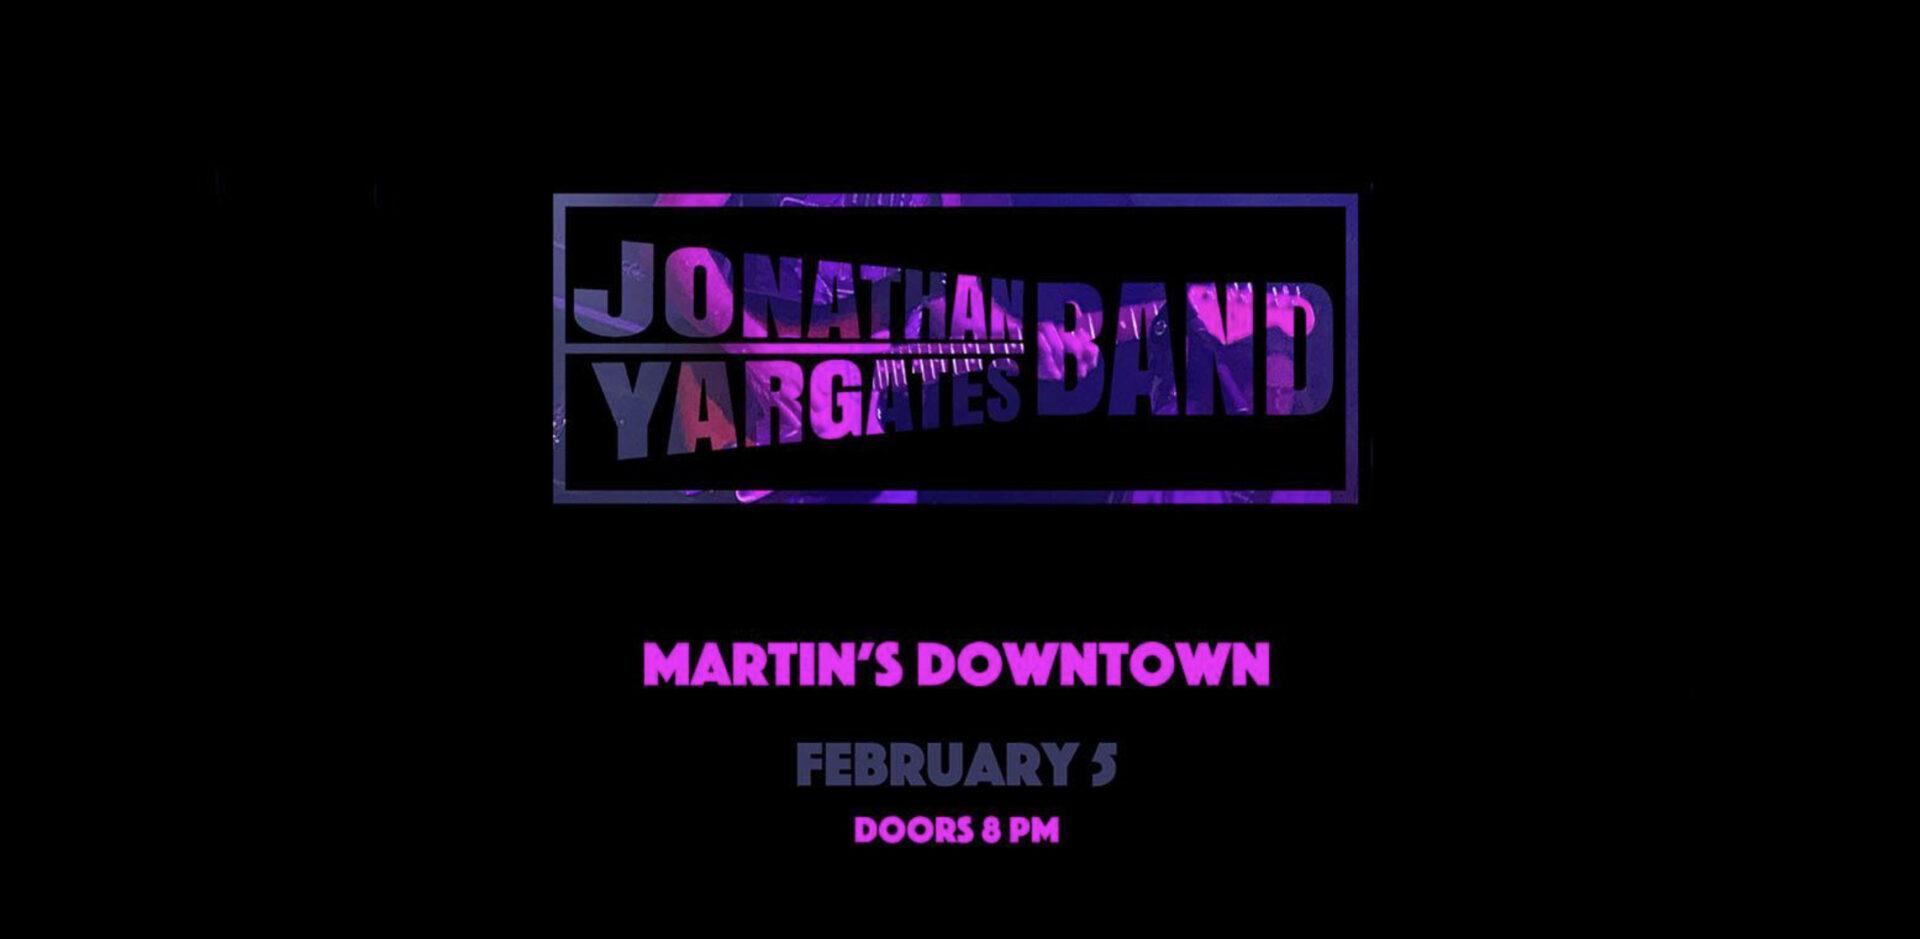 Jonathan Yargates Band